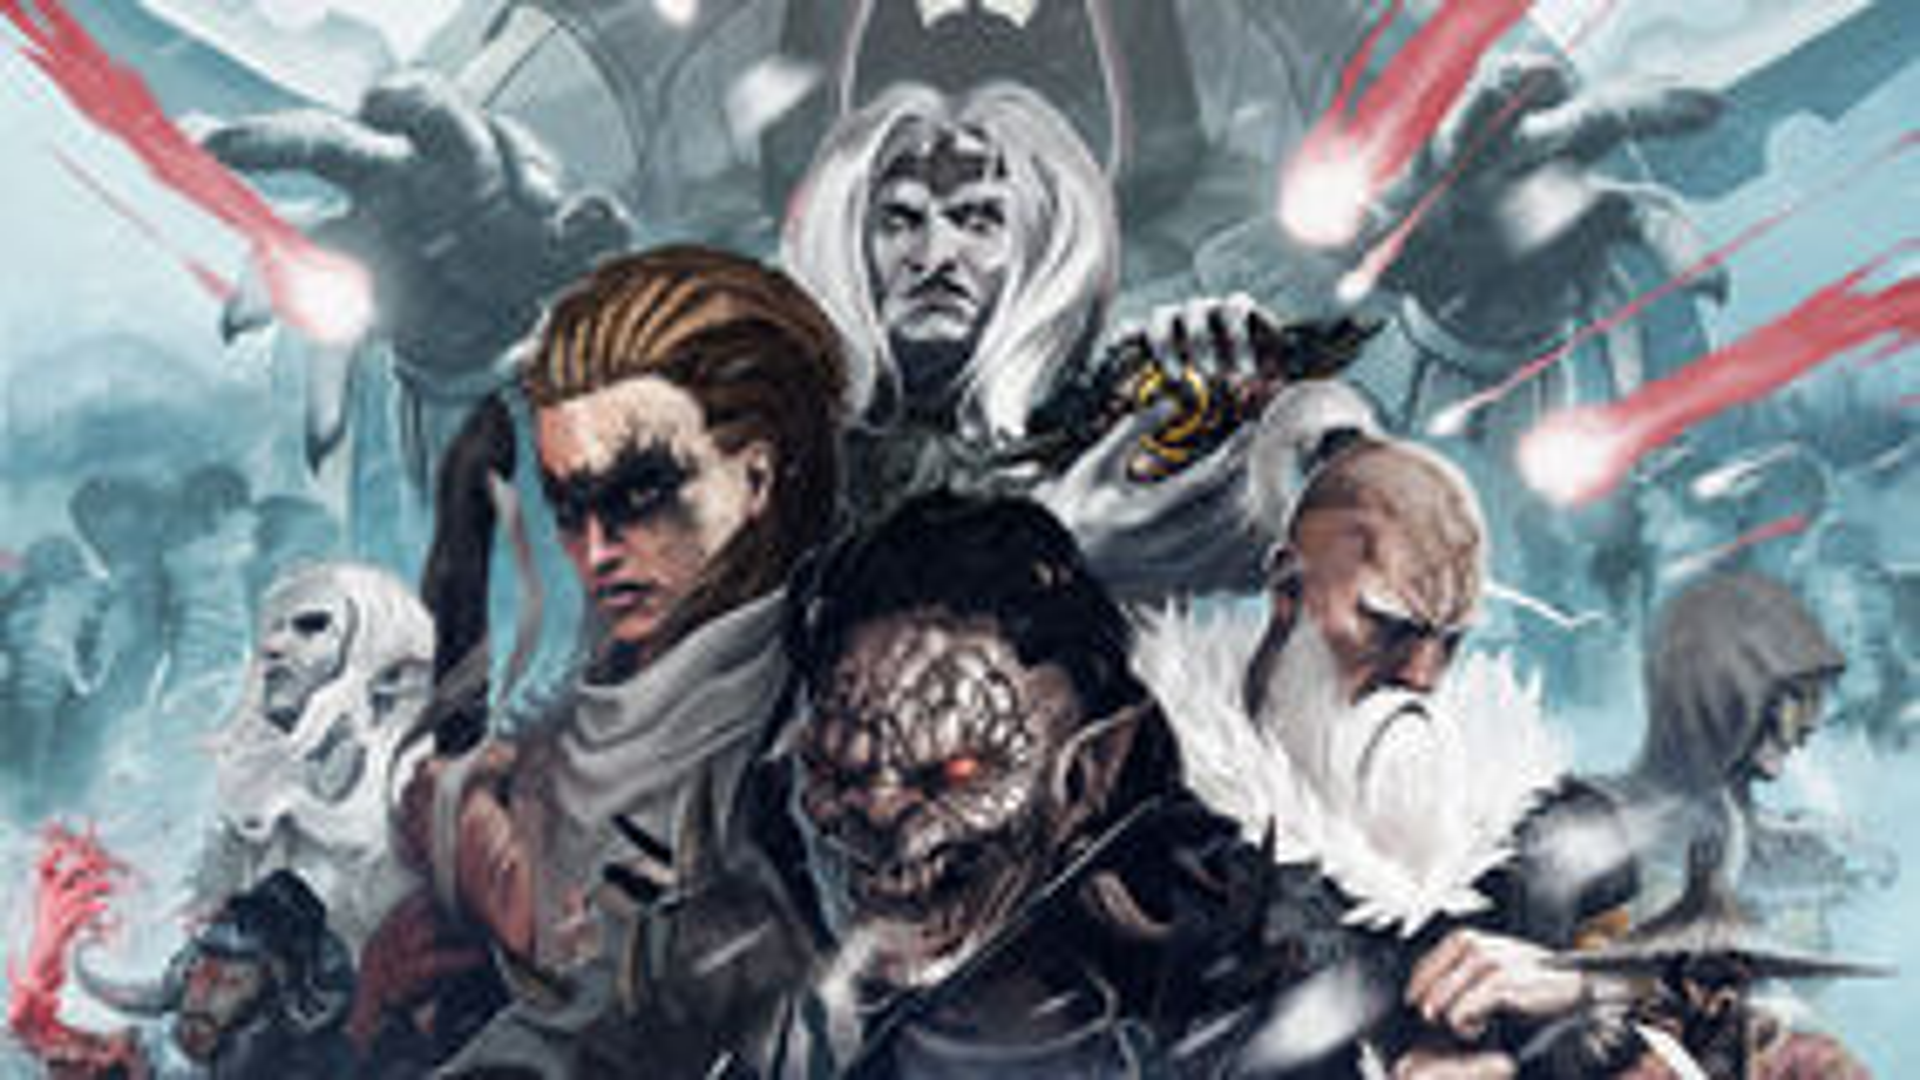 Uprising: Curse of the Last Emperor board game artwork